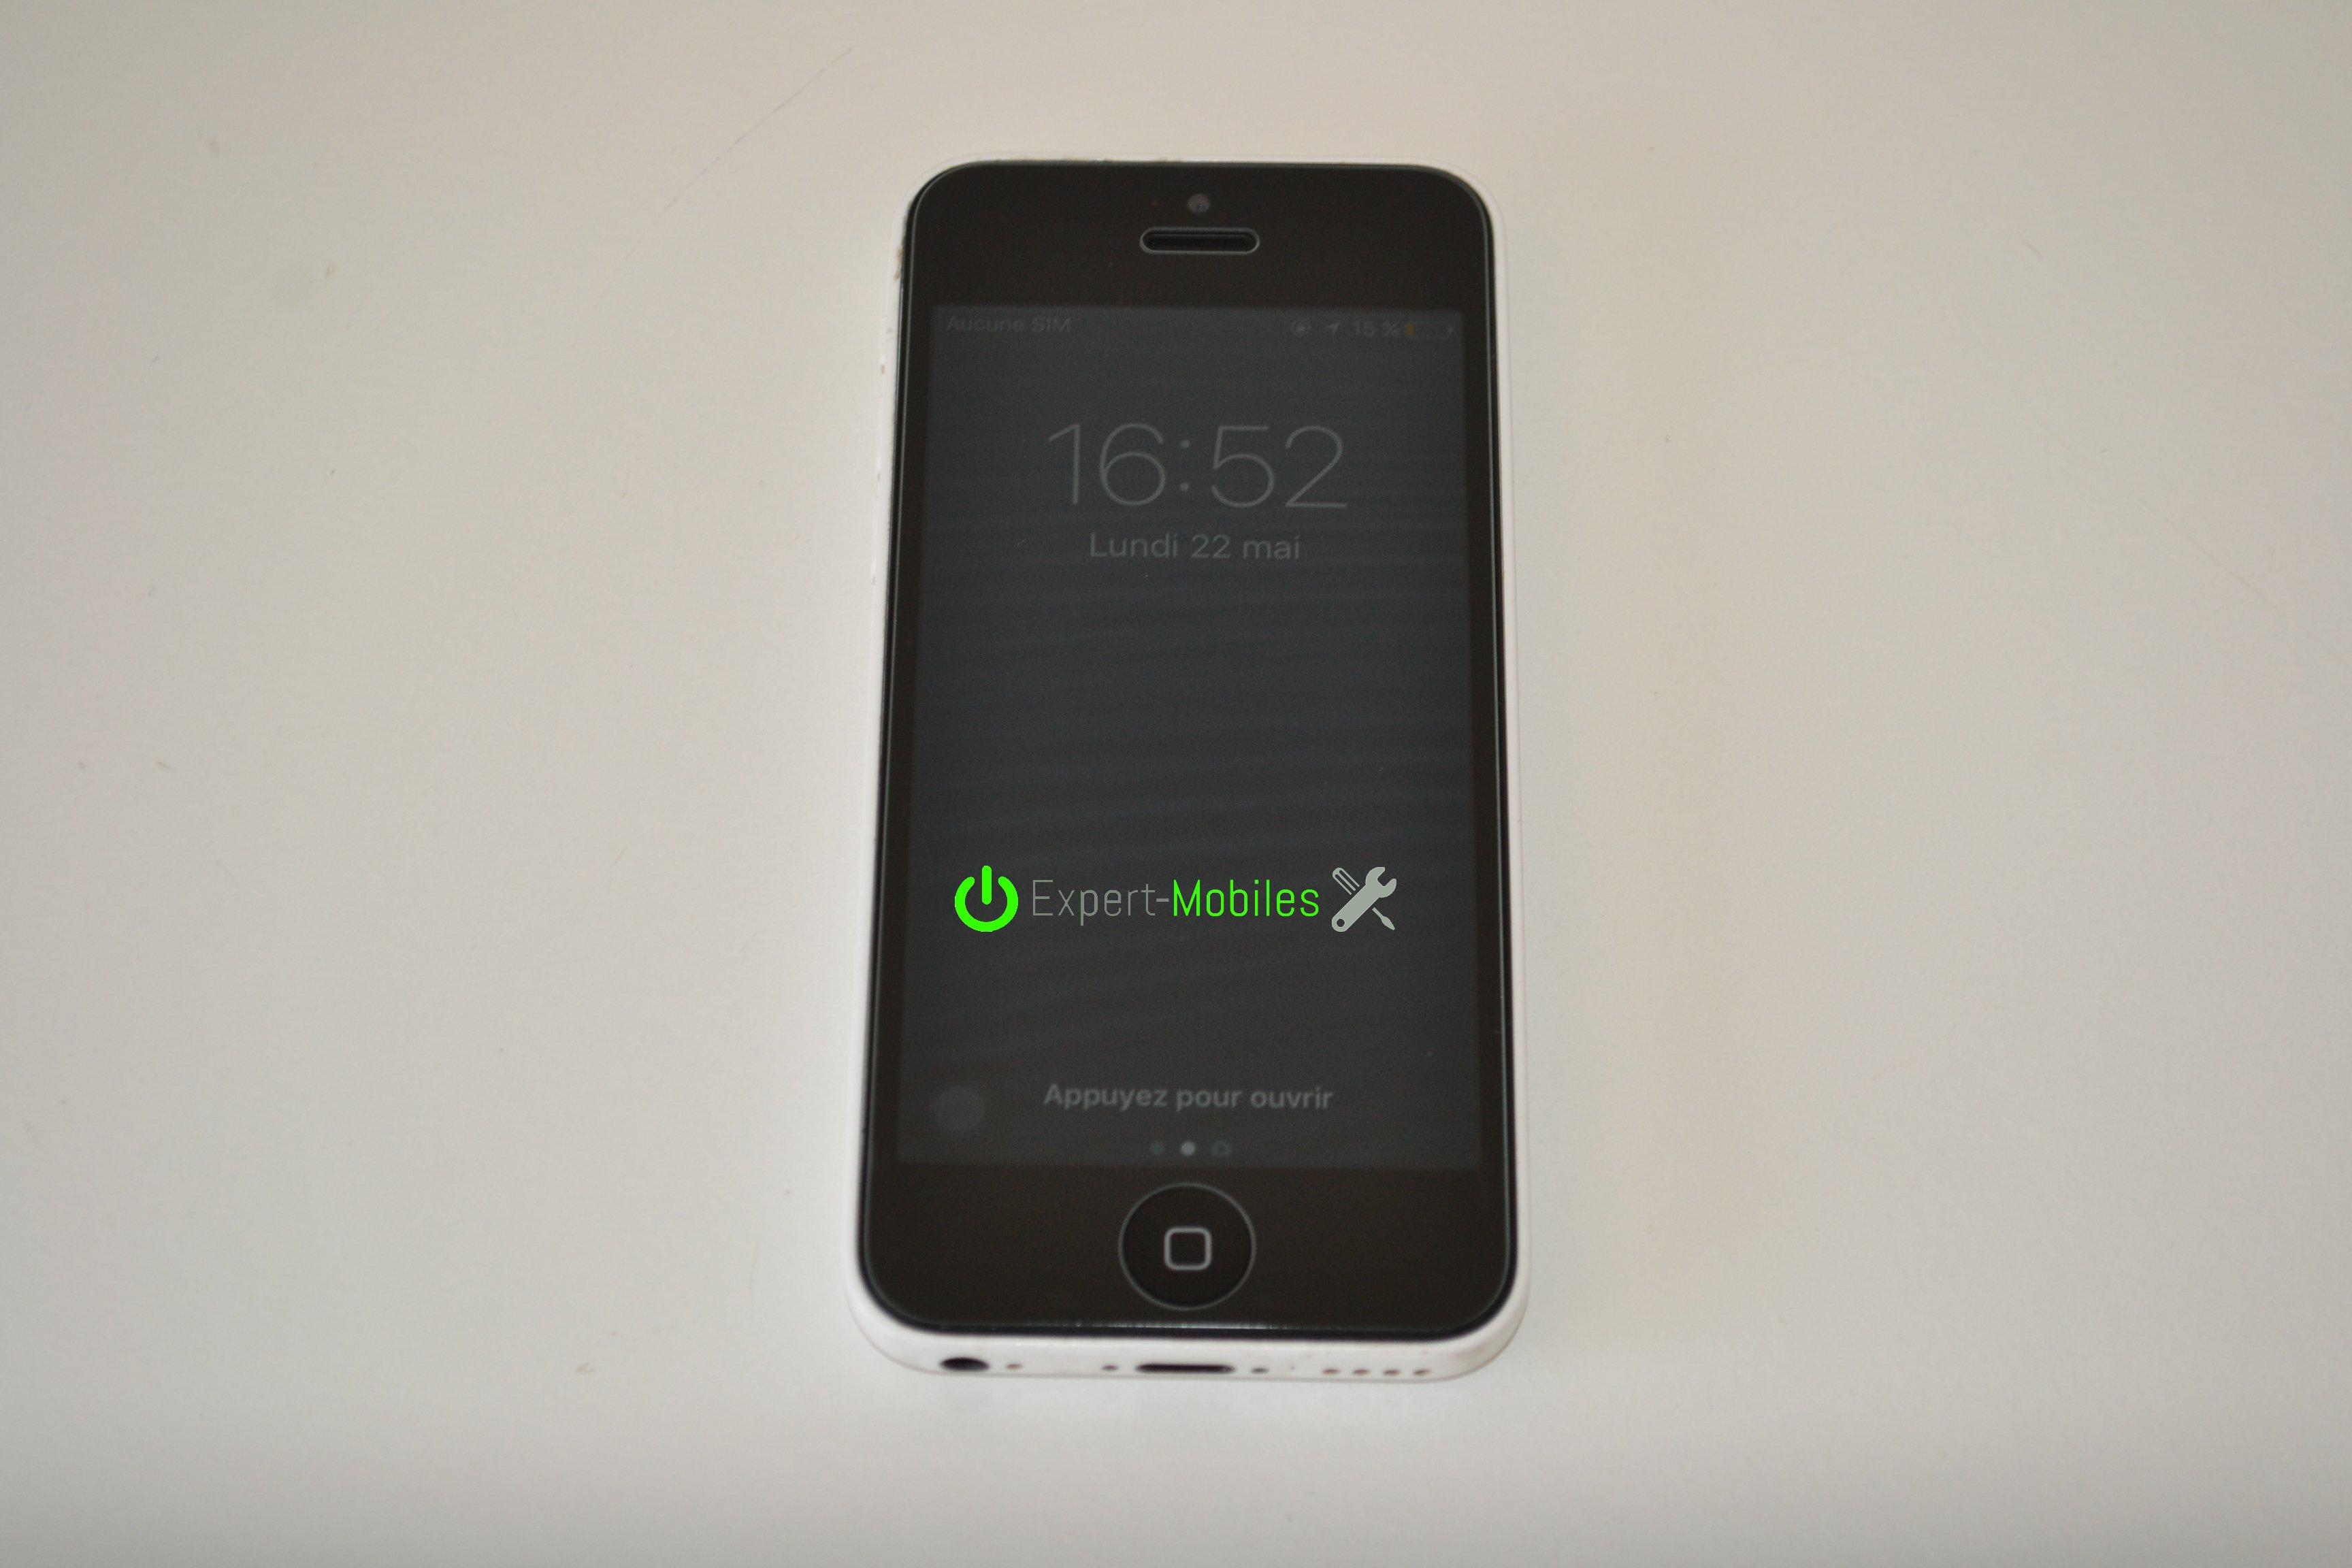 remplacement de l 39 cran d 39 un iphone 5c expert mobiles. Black Bedroom Furniture Sets. Home Design Ideas